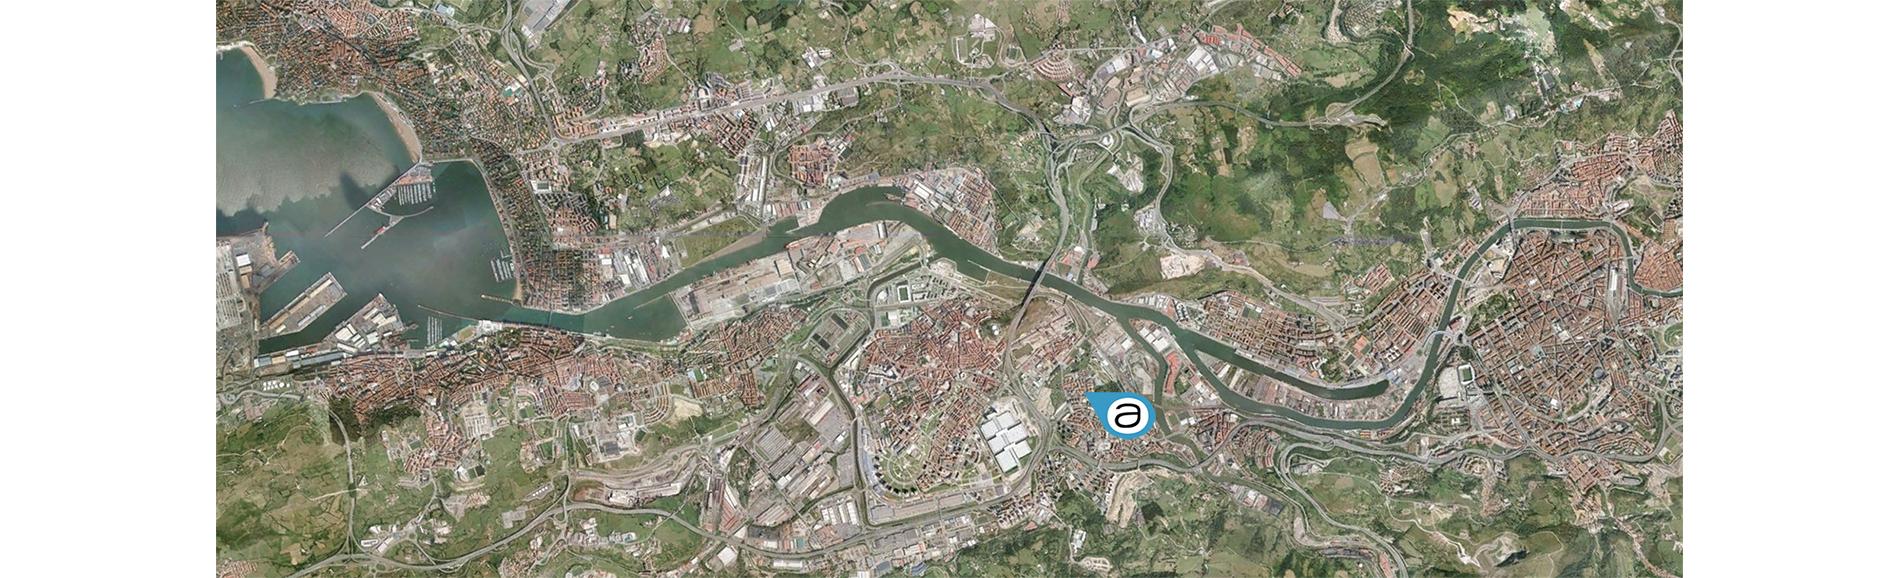 Ortofoto-Bilbao